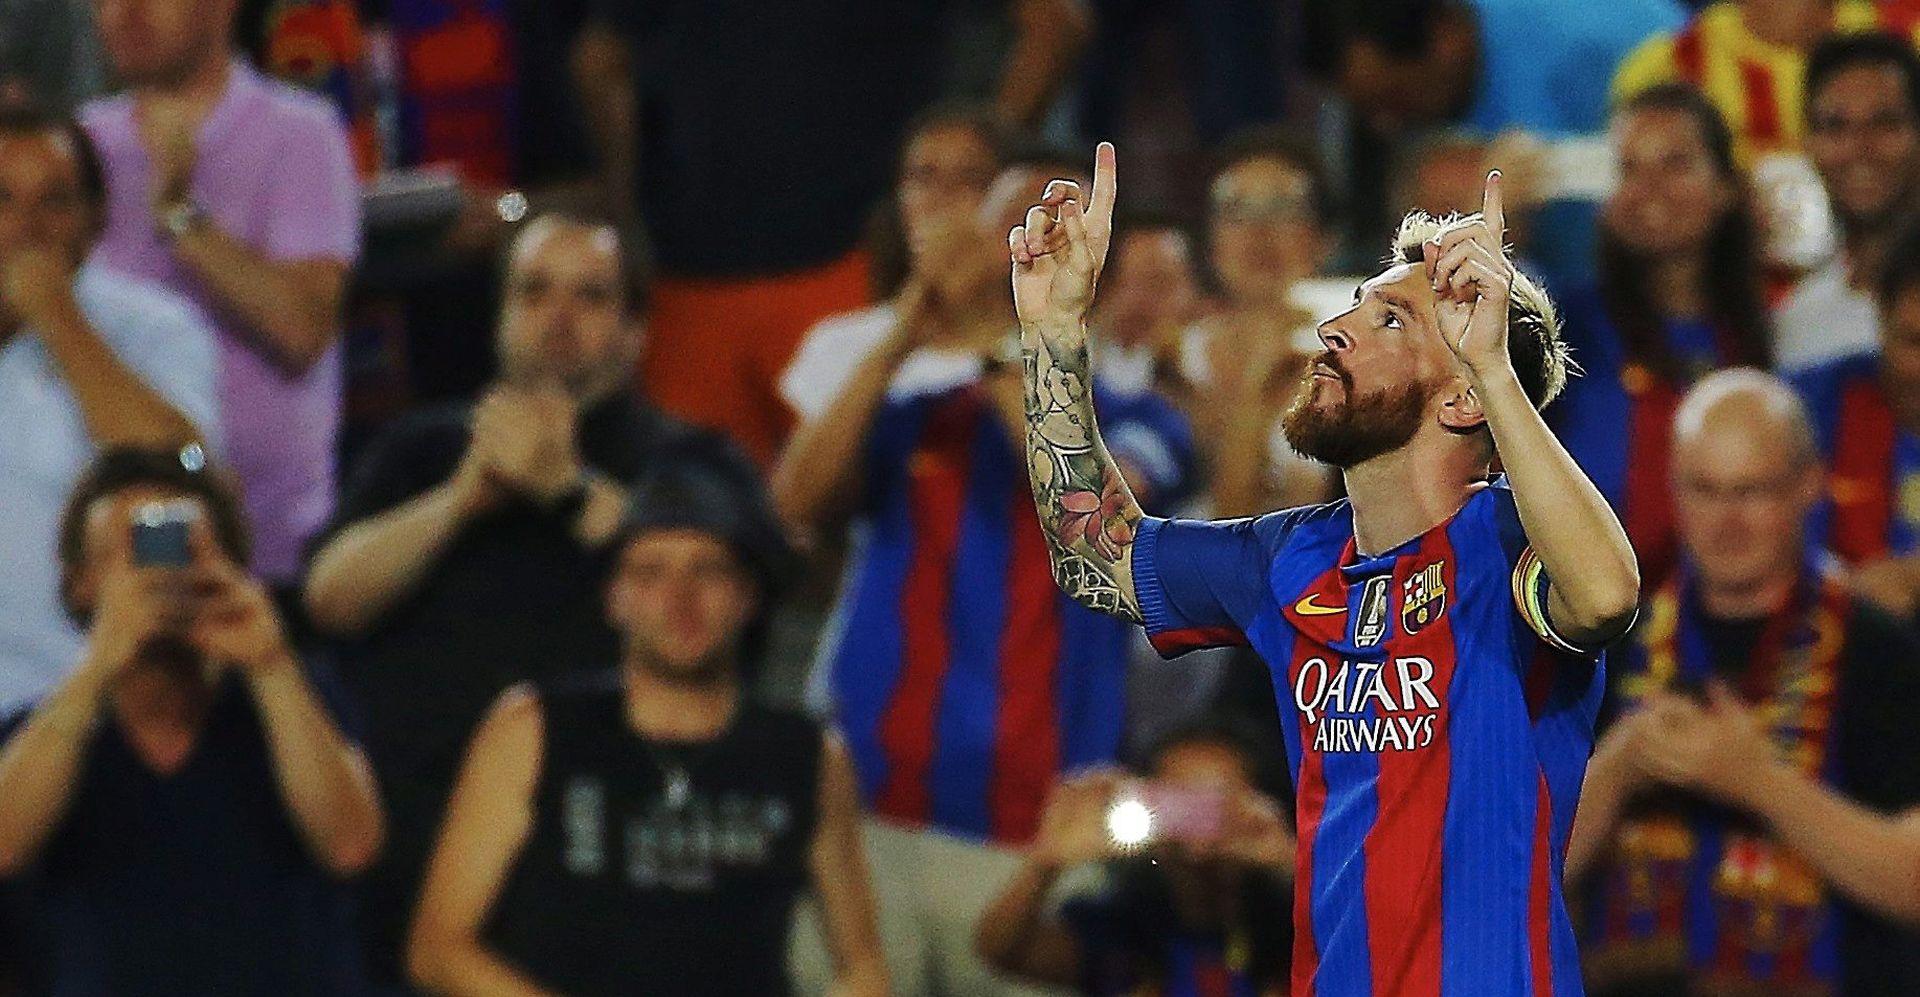 ZABRINUTOST U BARCI Leo Messi 'out' tri tjedna